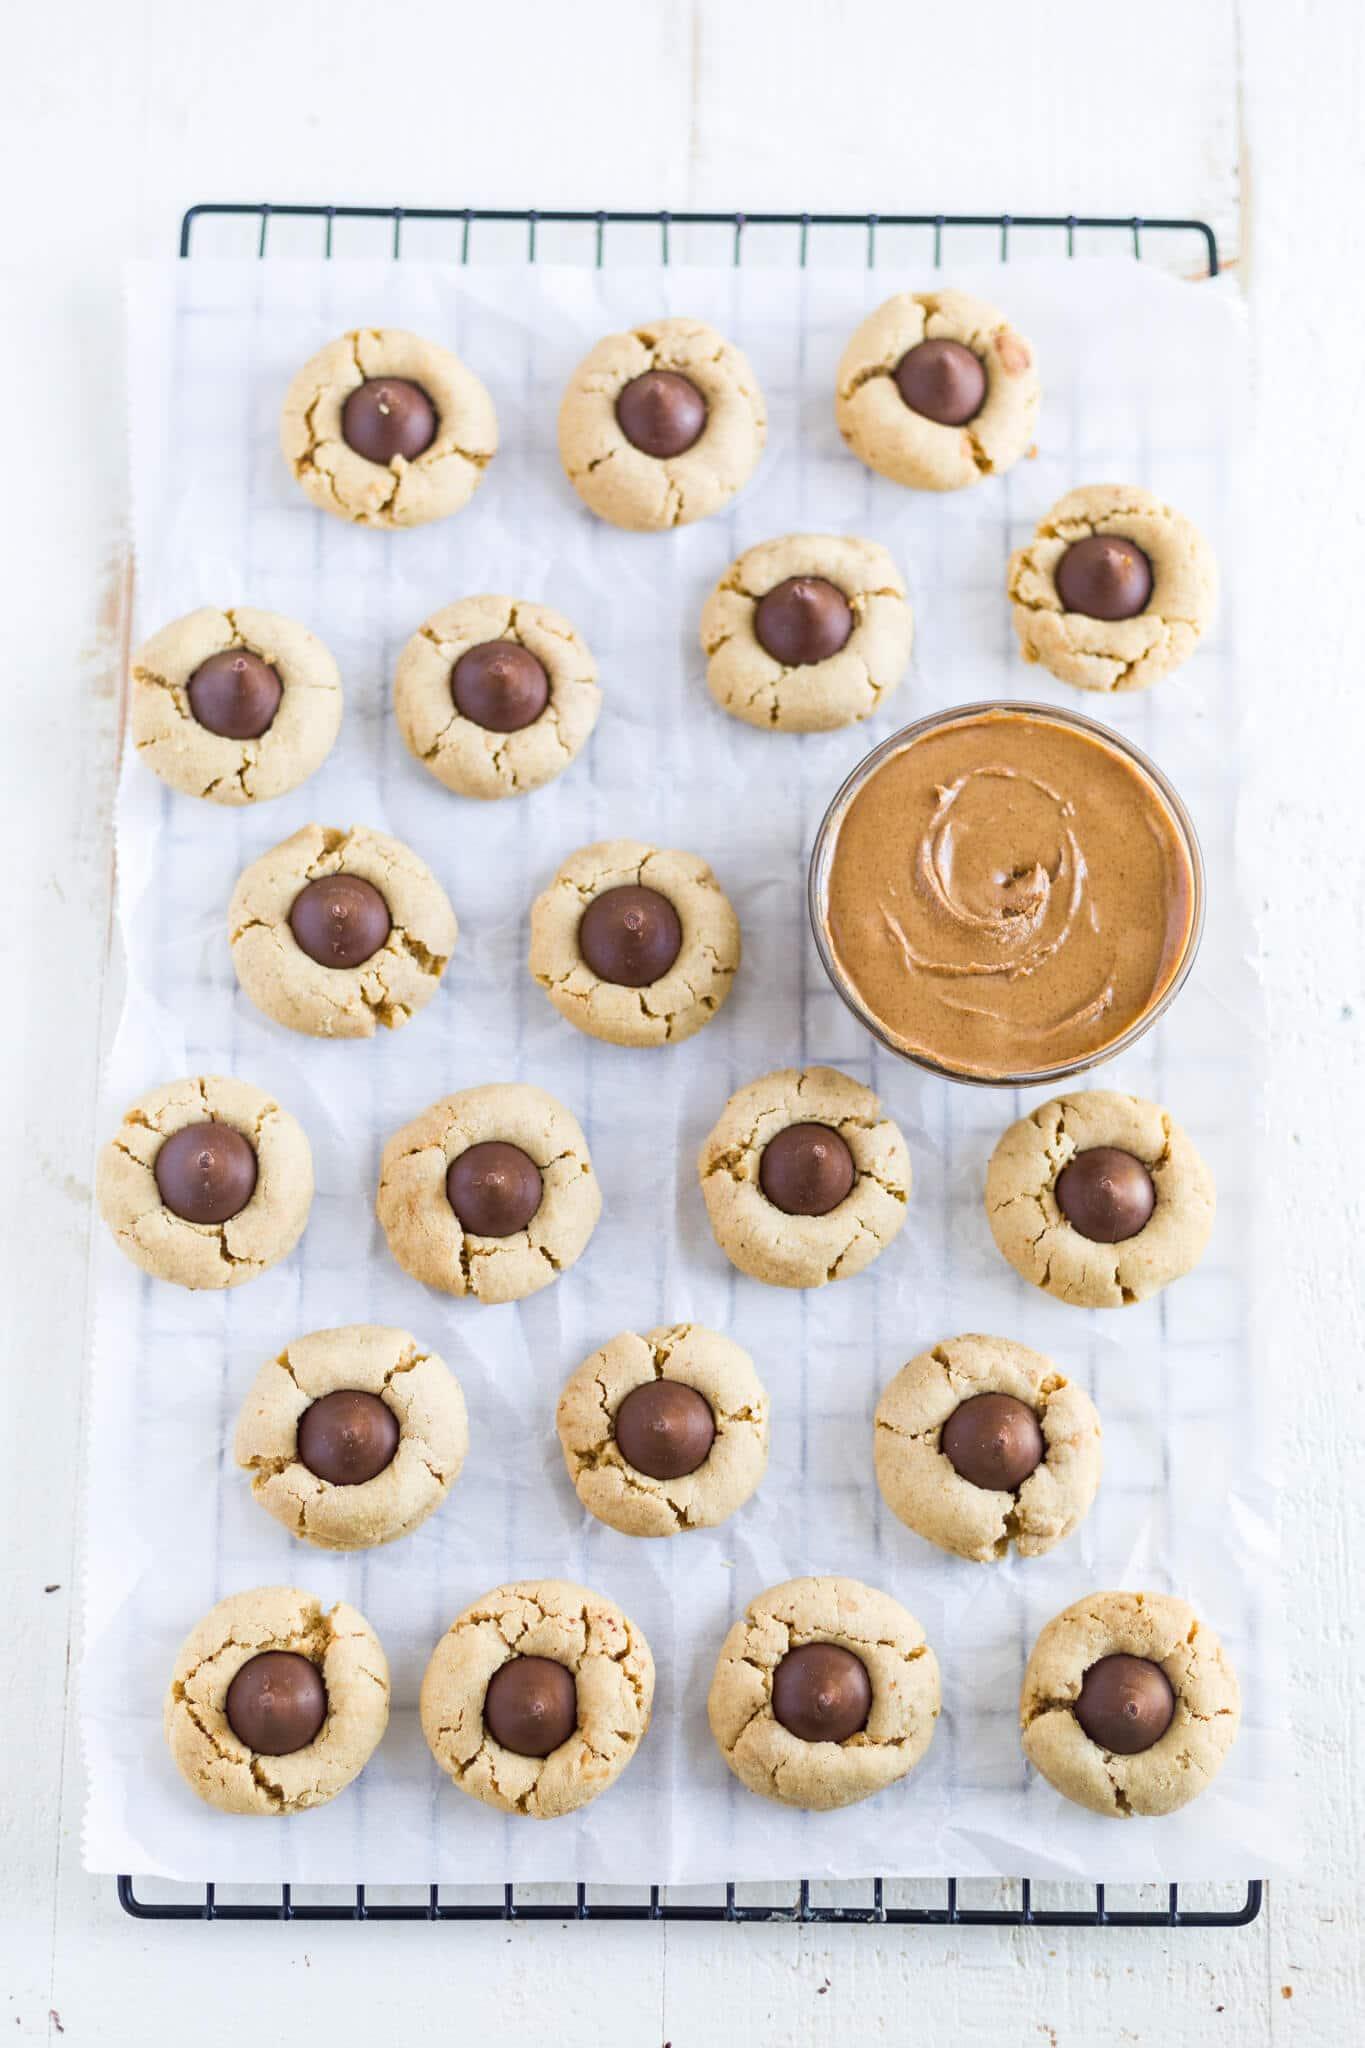 Hershey's gluten free peanut butter blossoms